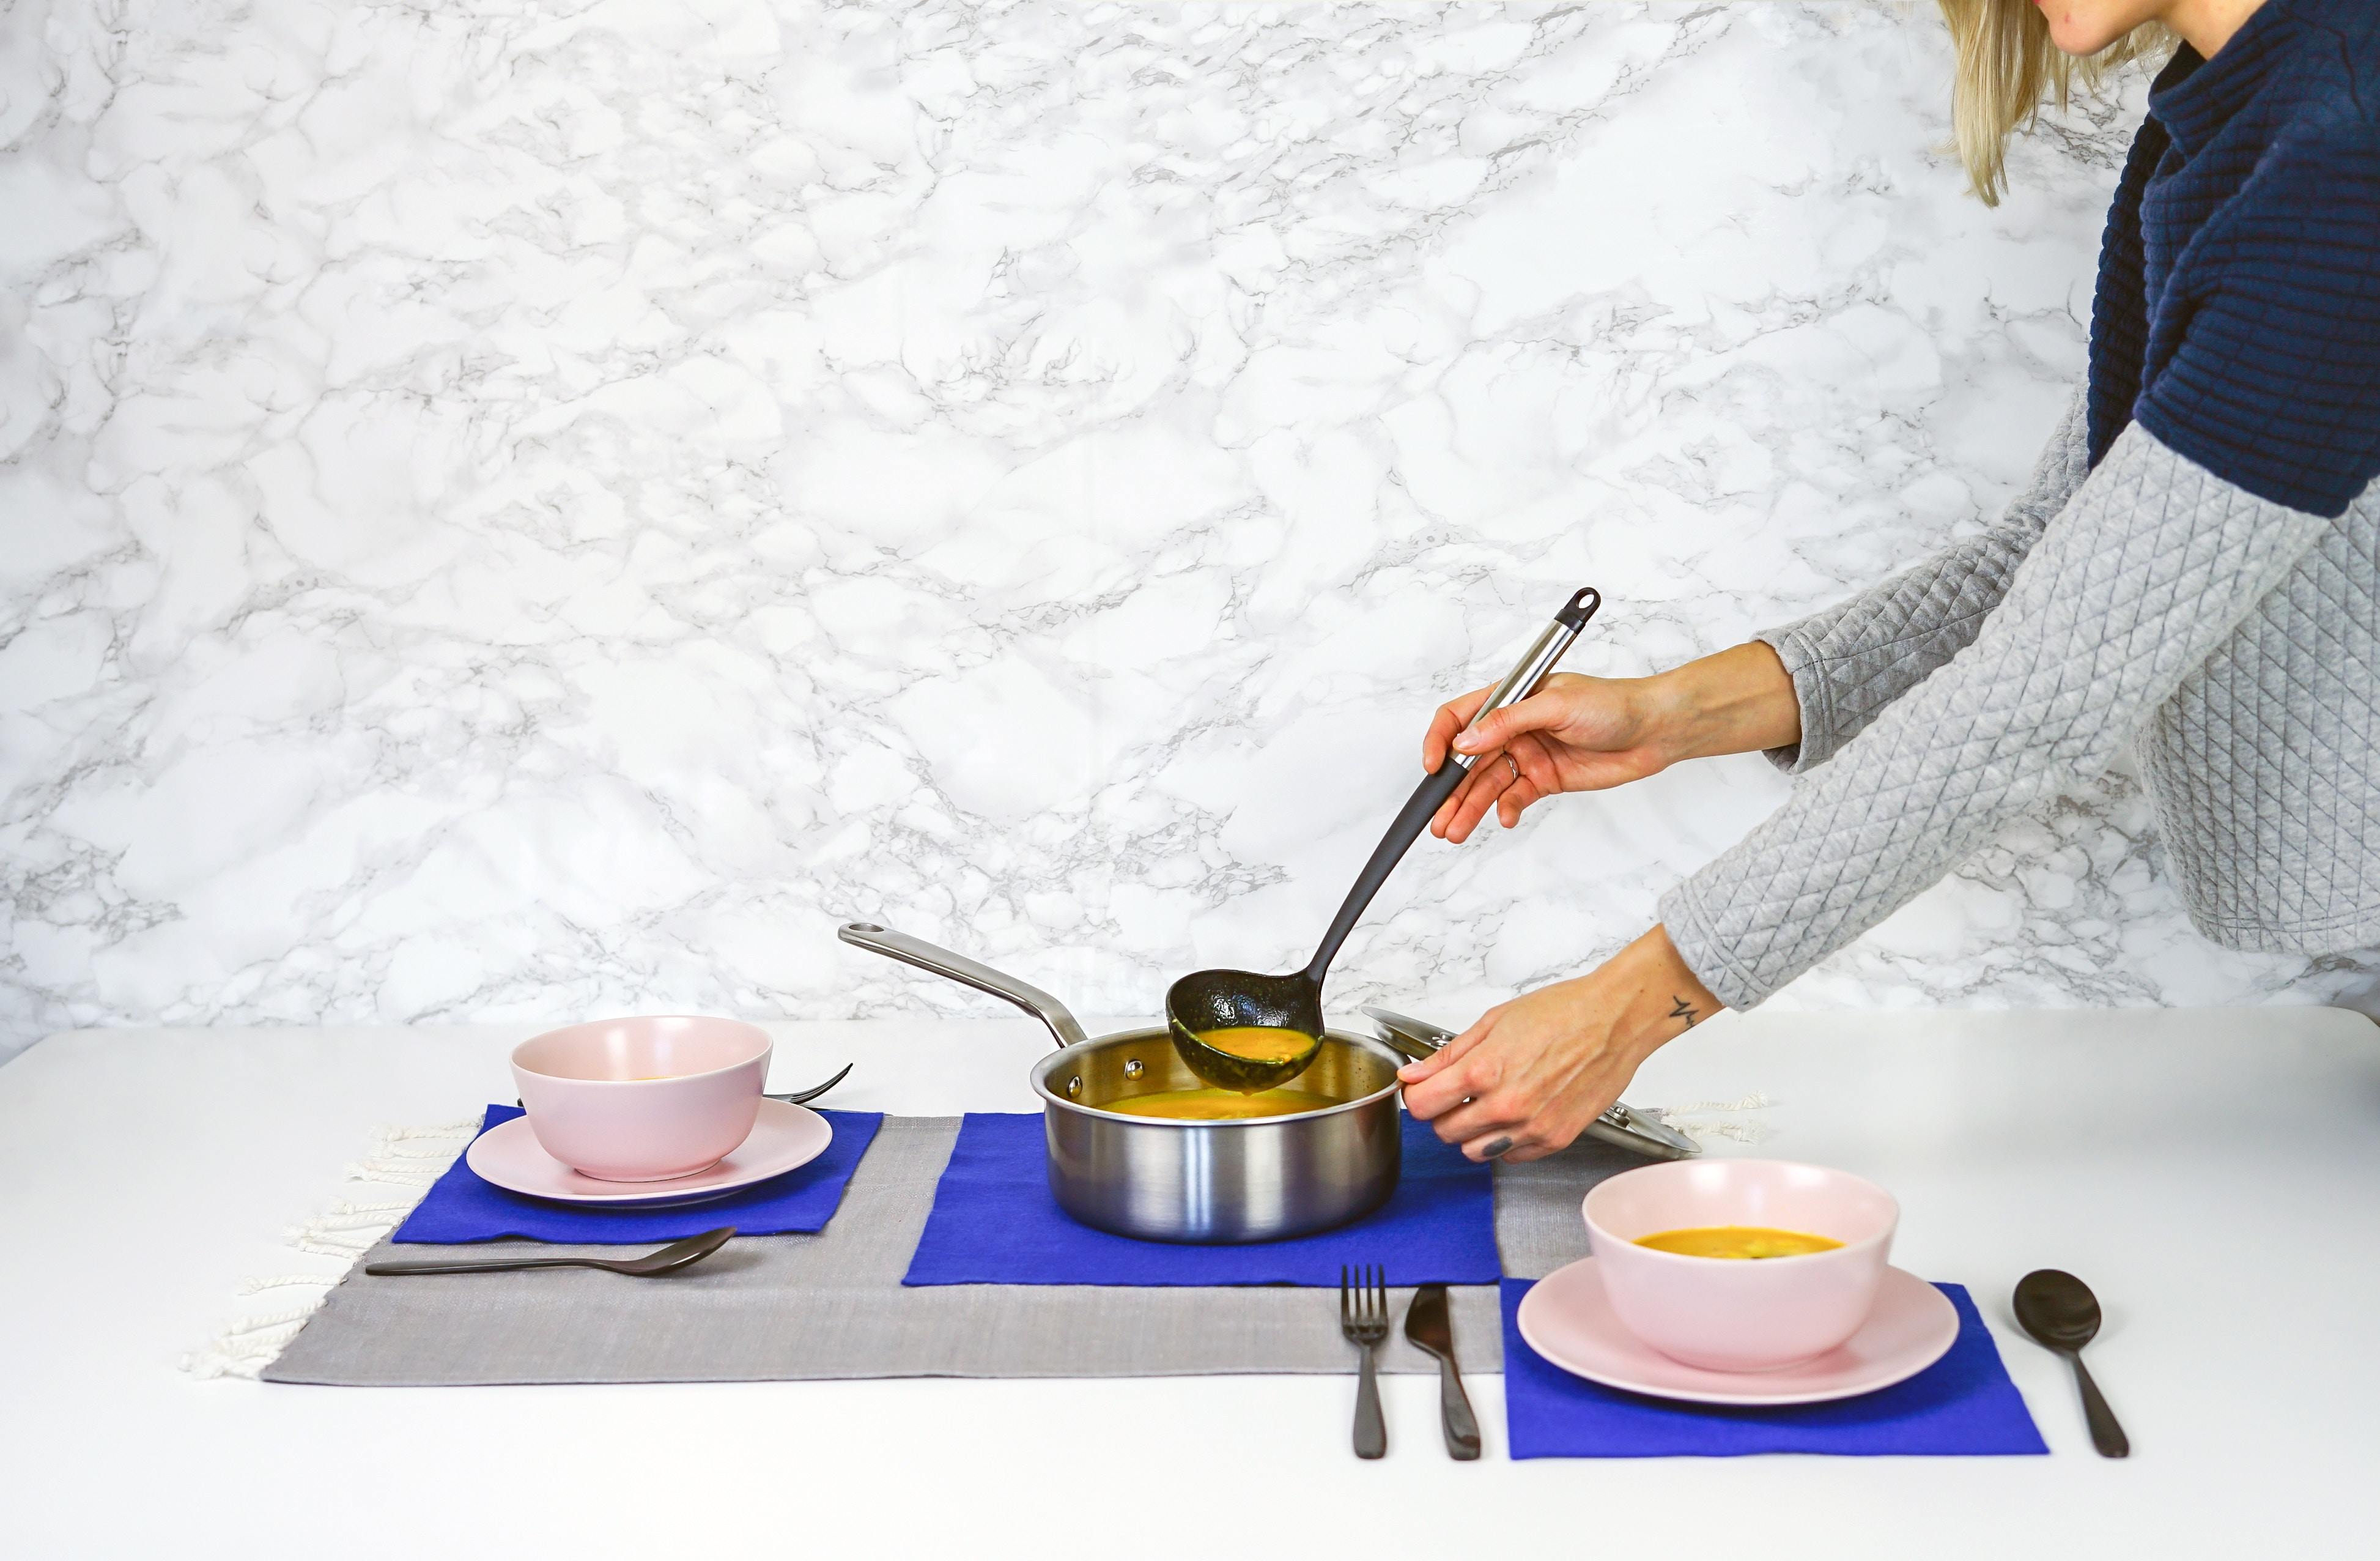 Frau richtet Suppe in zwei Schüsseln an.